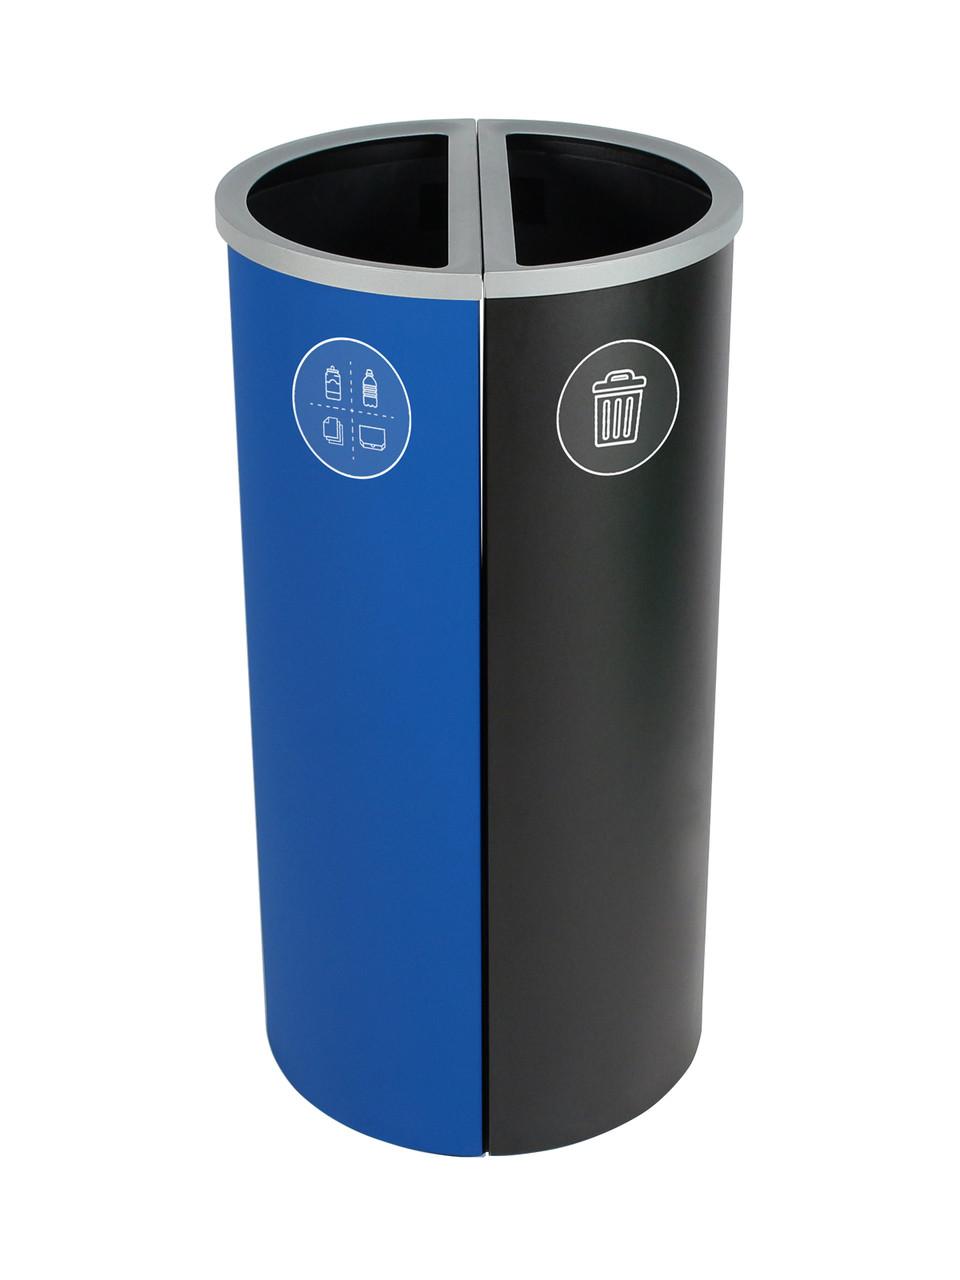 16 Gallon Spectrum Round Trash Can & Recycle Bin Blue/Black 8107083-24